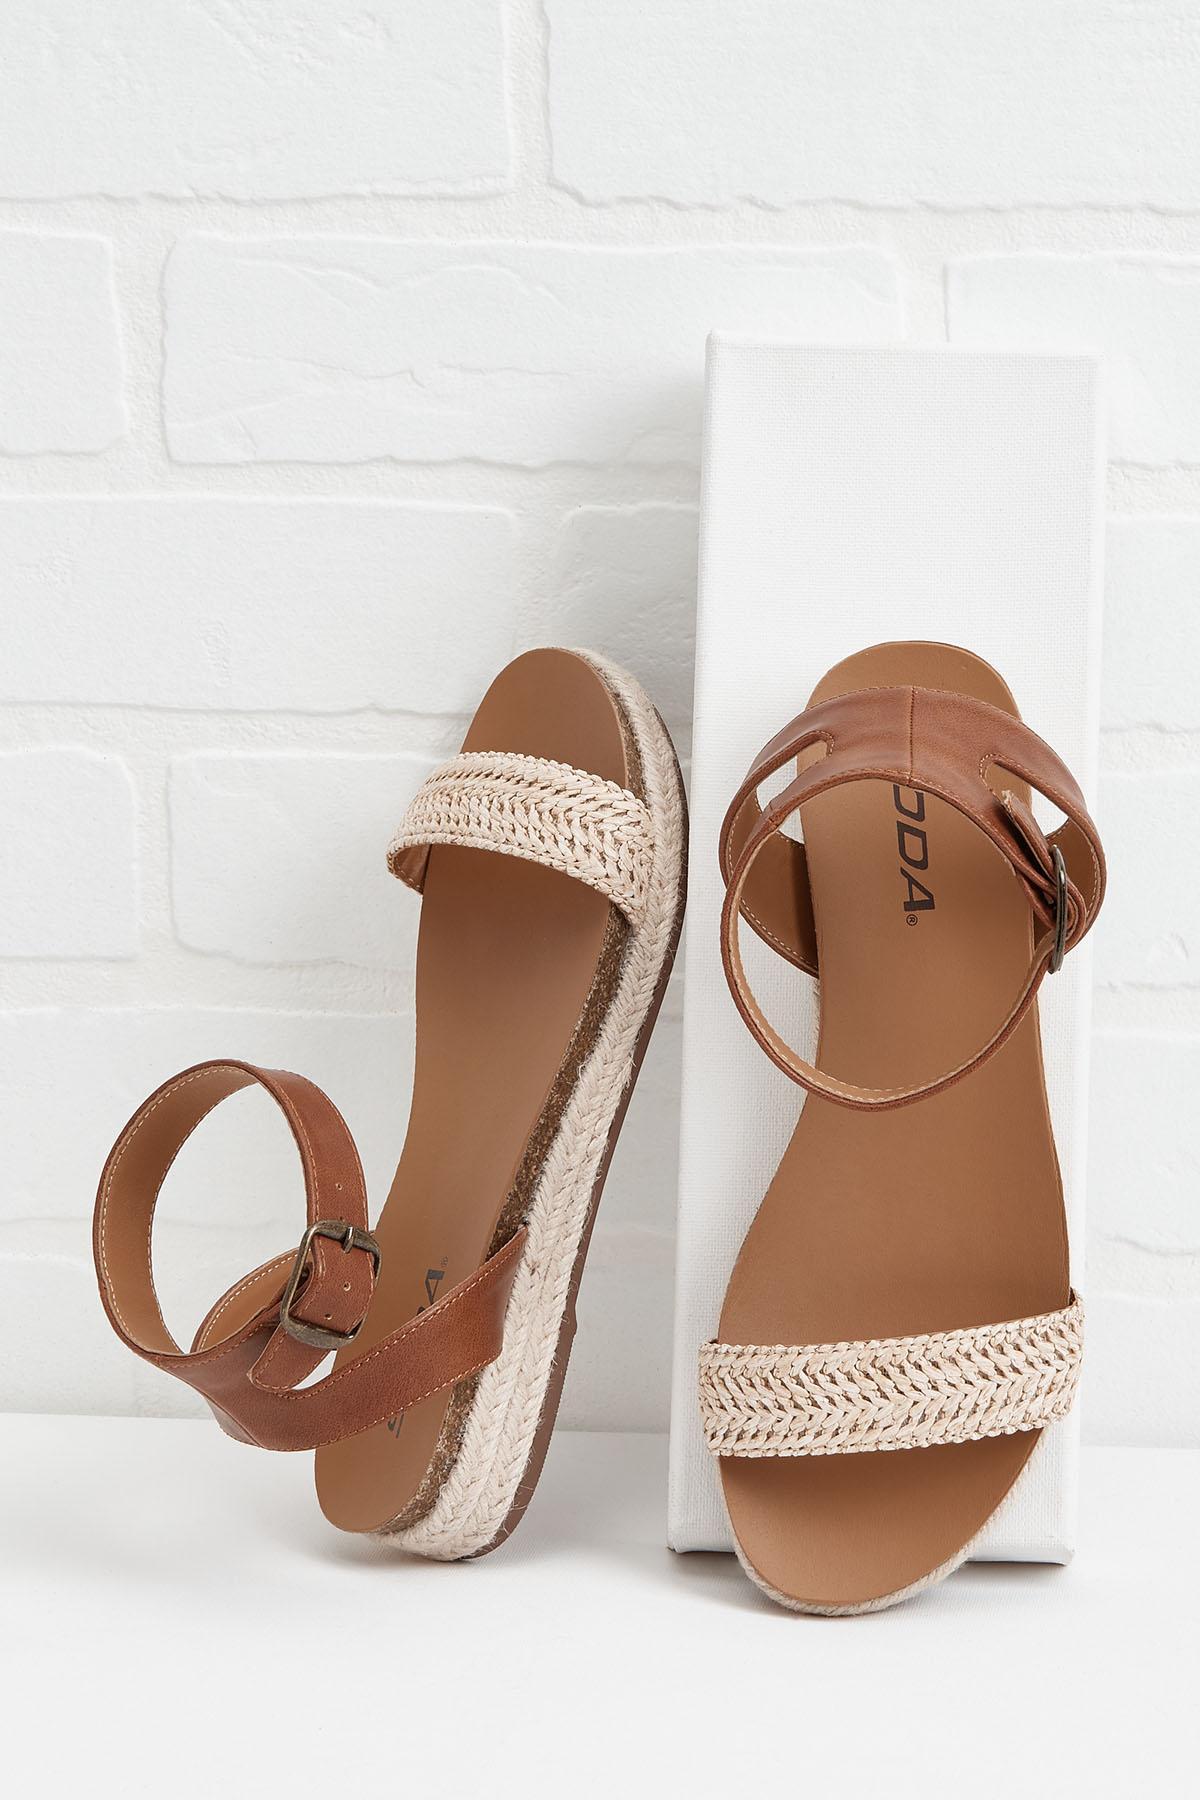 The Last Straw Sandals